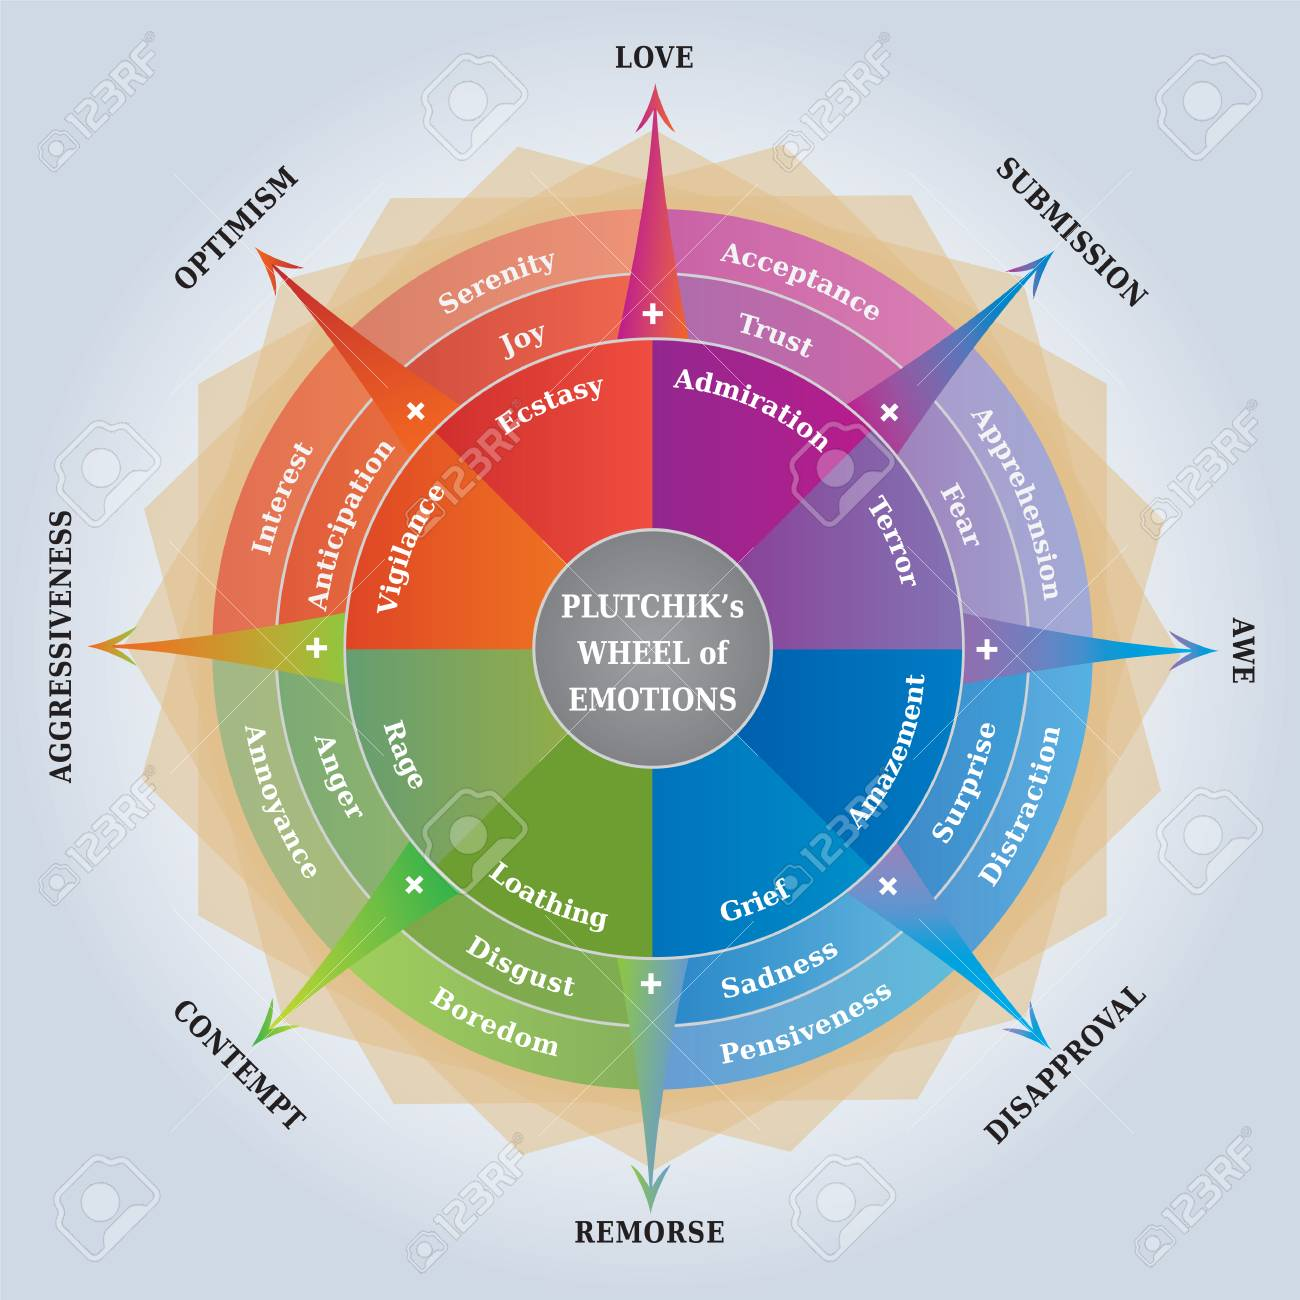 Pluckiks Wheel of Emotions - Psychology Diagram - Coaching / Learning Tool - English Language - 107528971